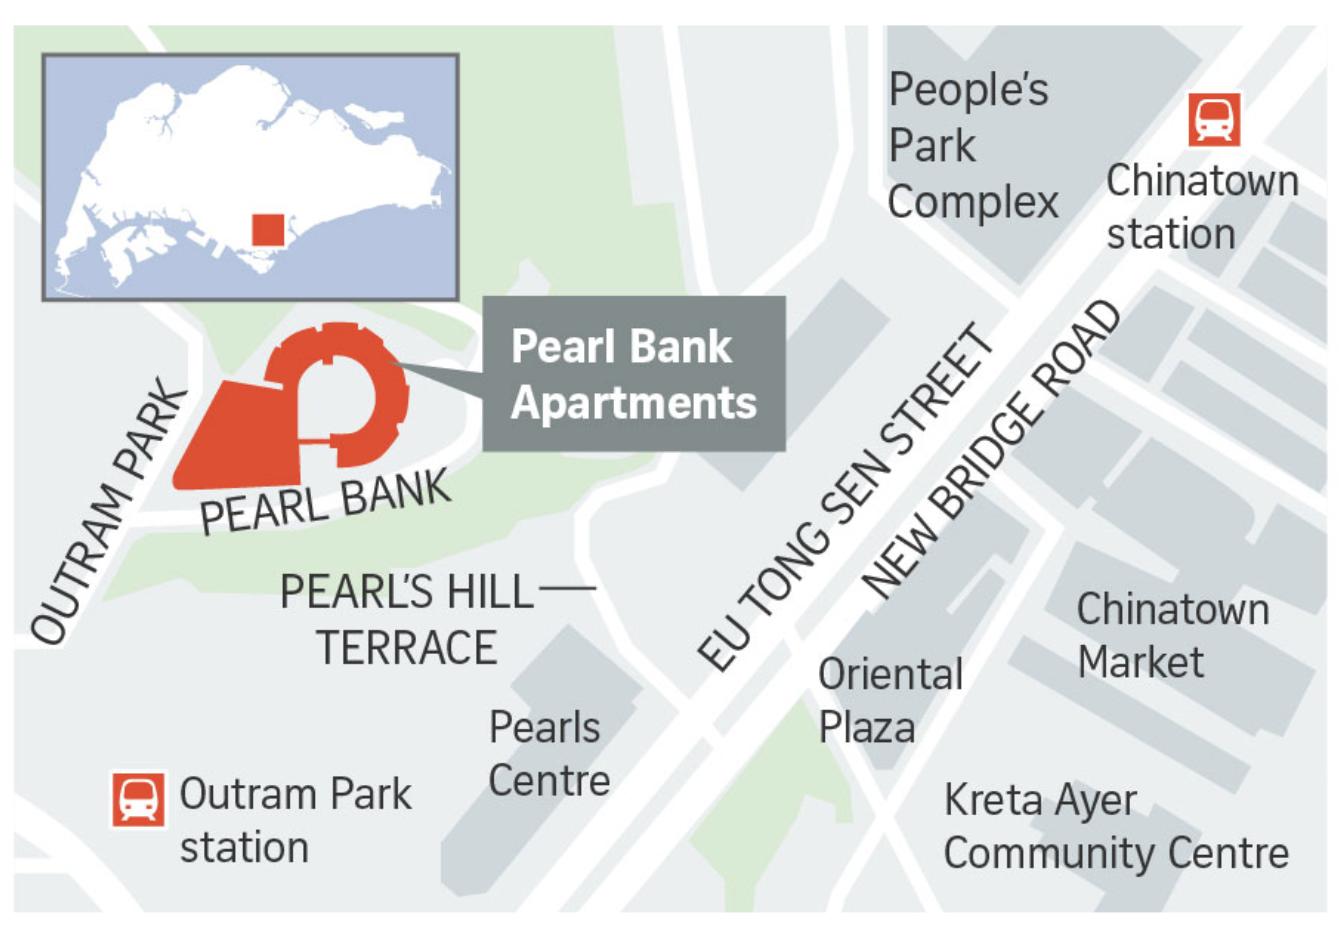 One Pearl Bank Showflat